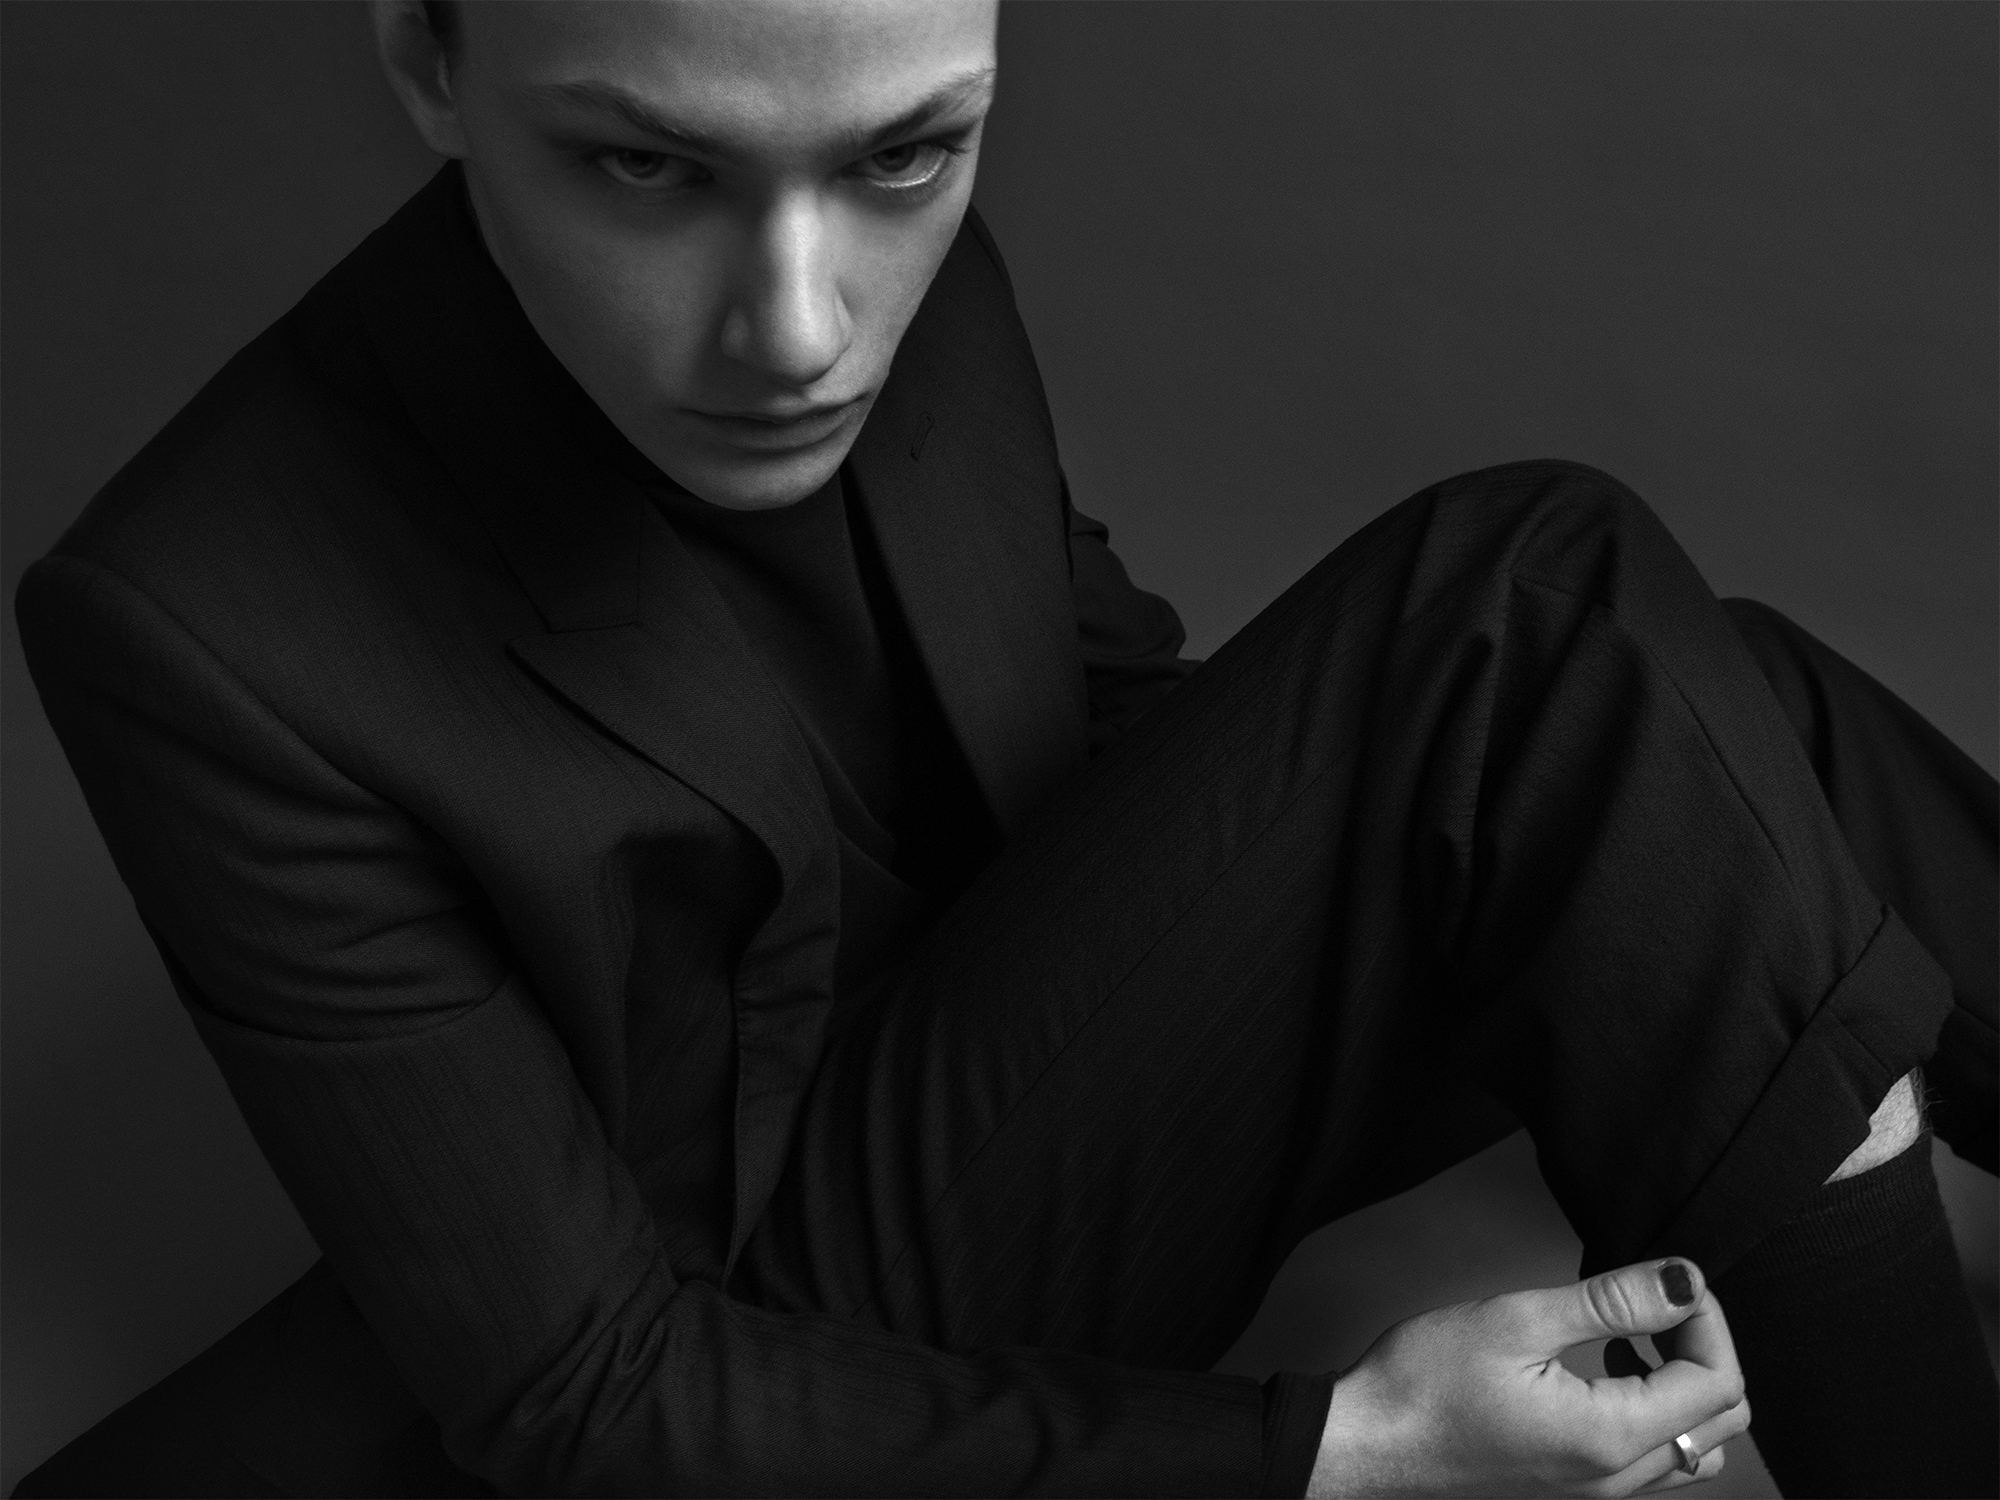 Eliot @imgmodels @eliotgryn in Celine Homme ©Buonomo & Cometti